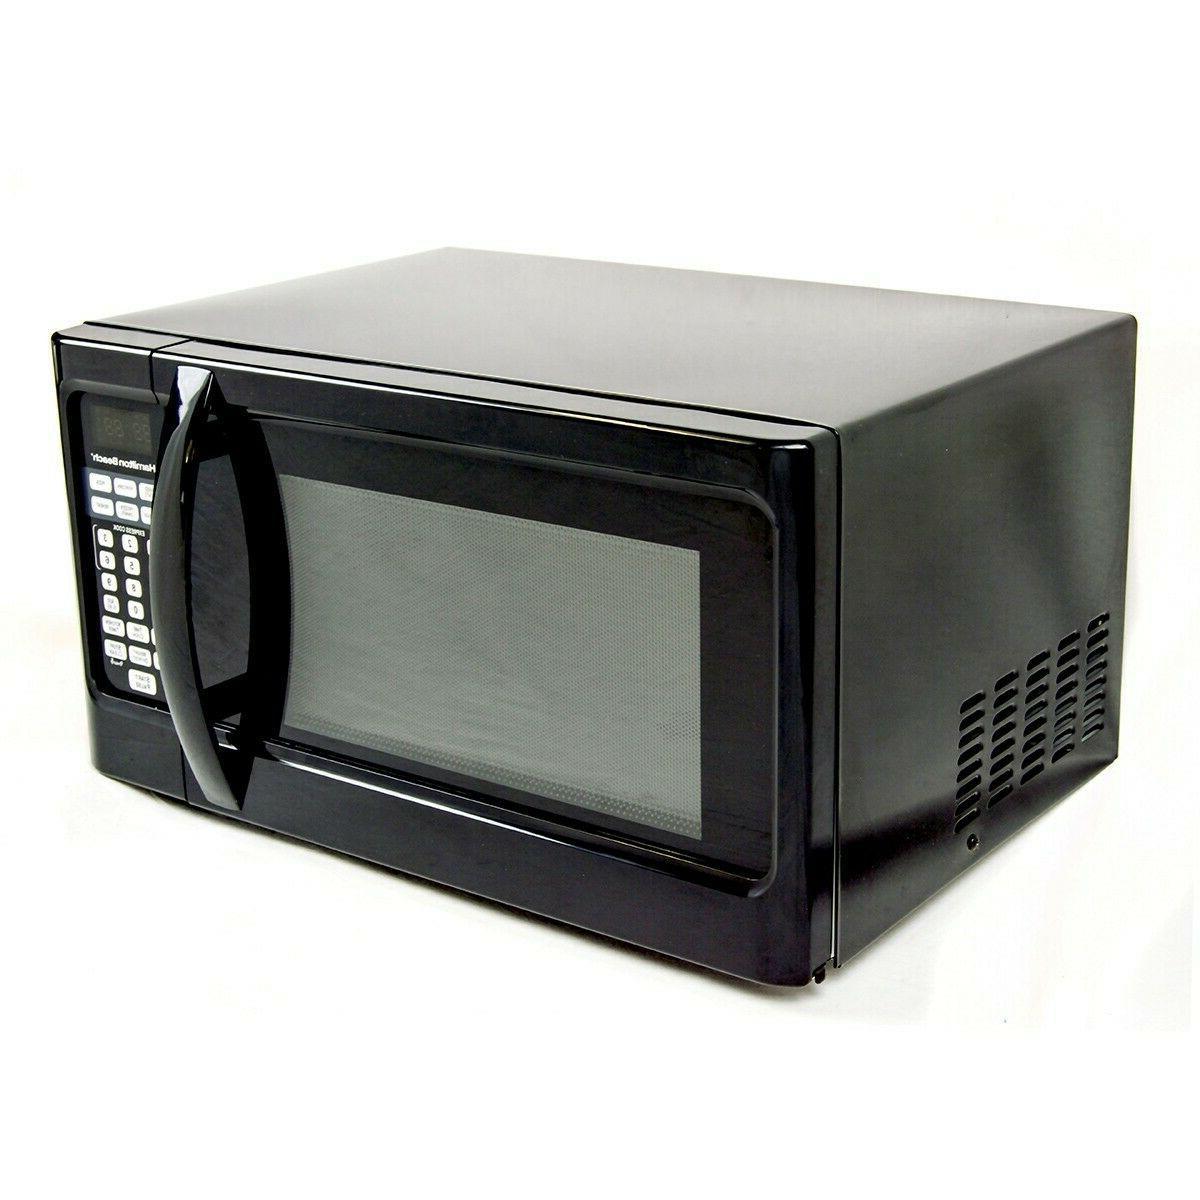 Hamilton Beach Ft Microwave Oven, Watt,Black